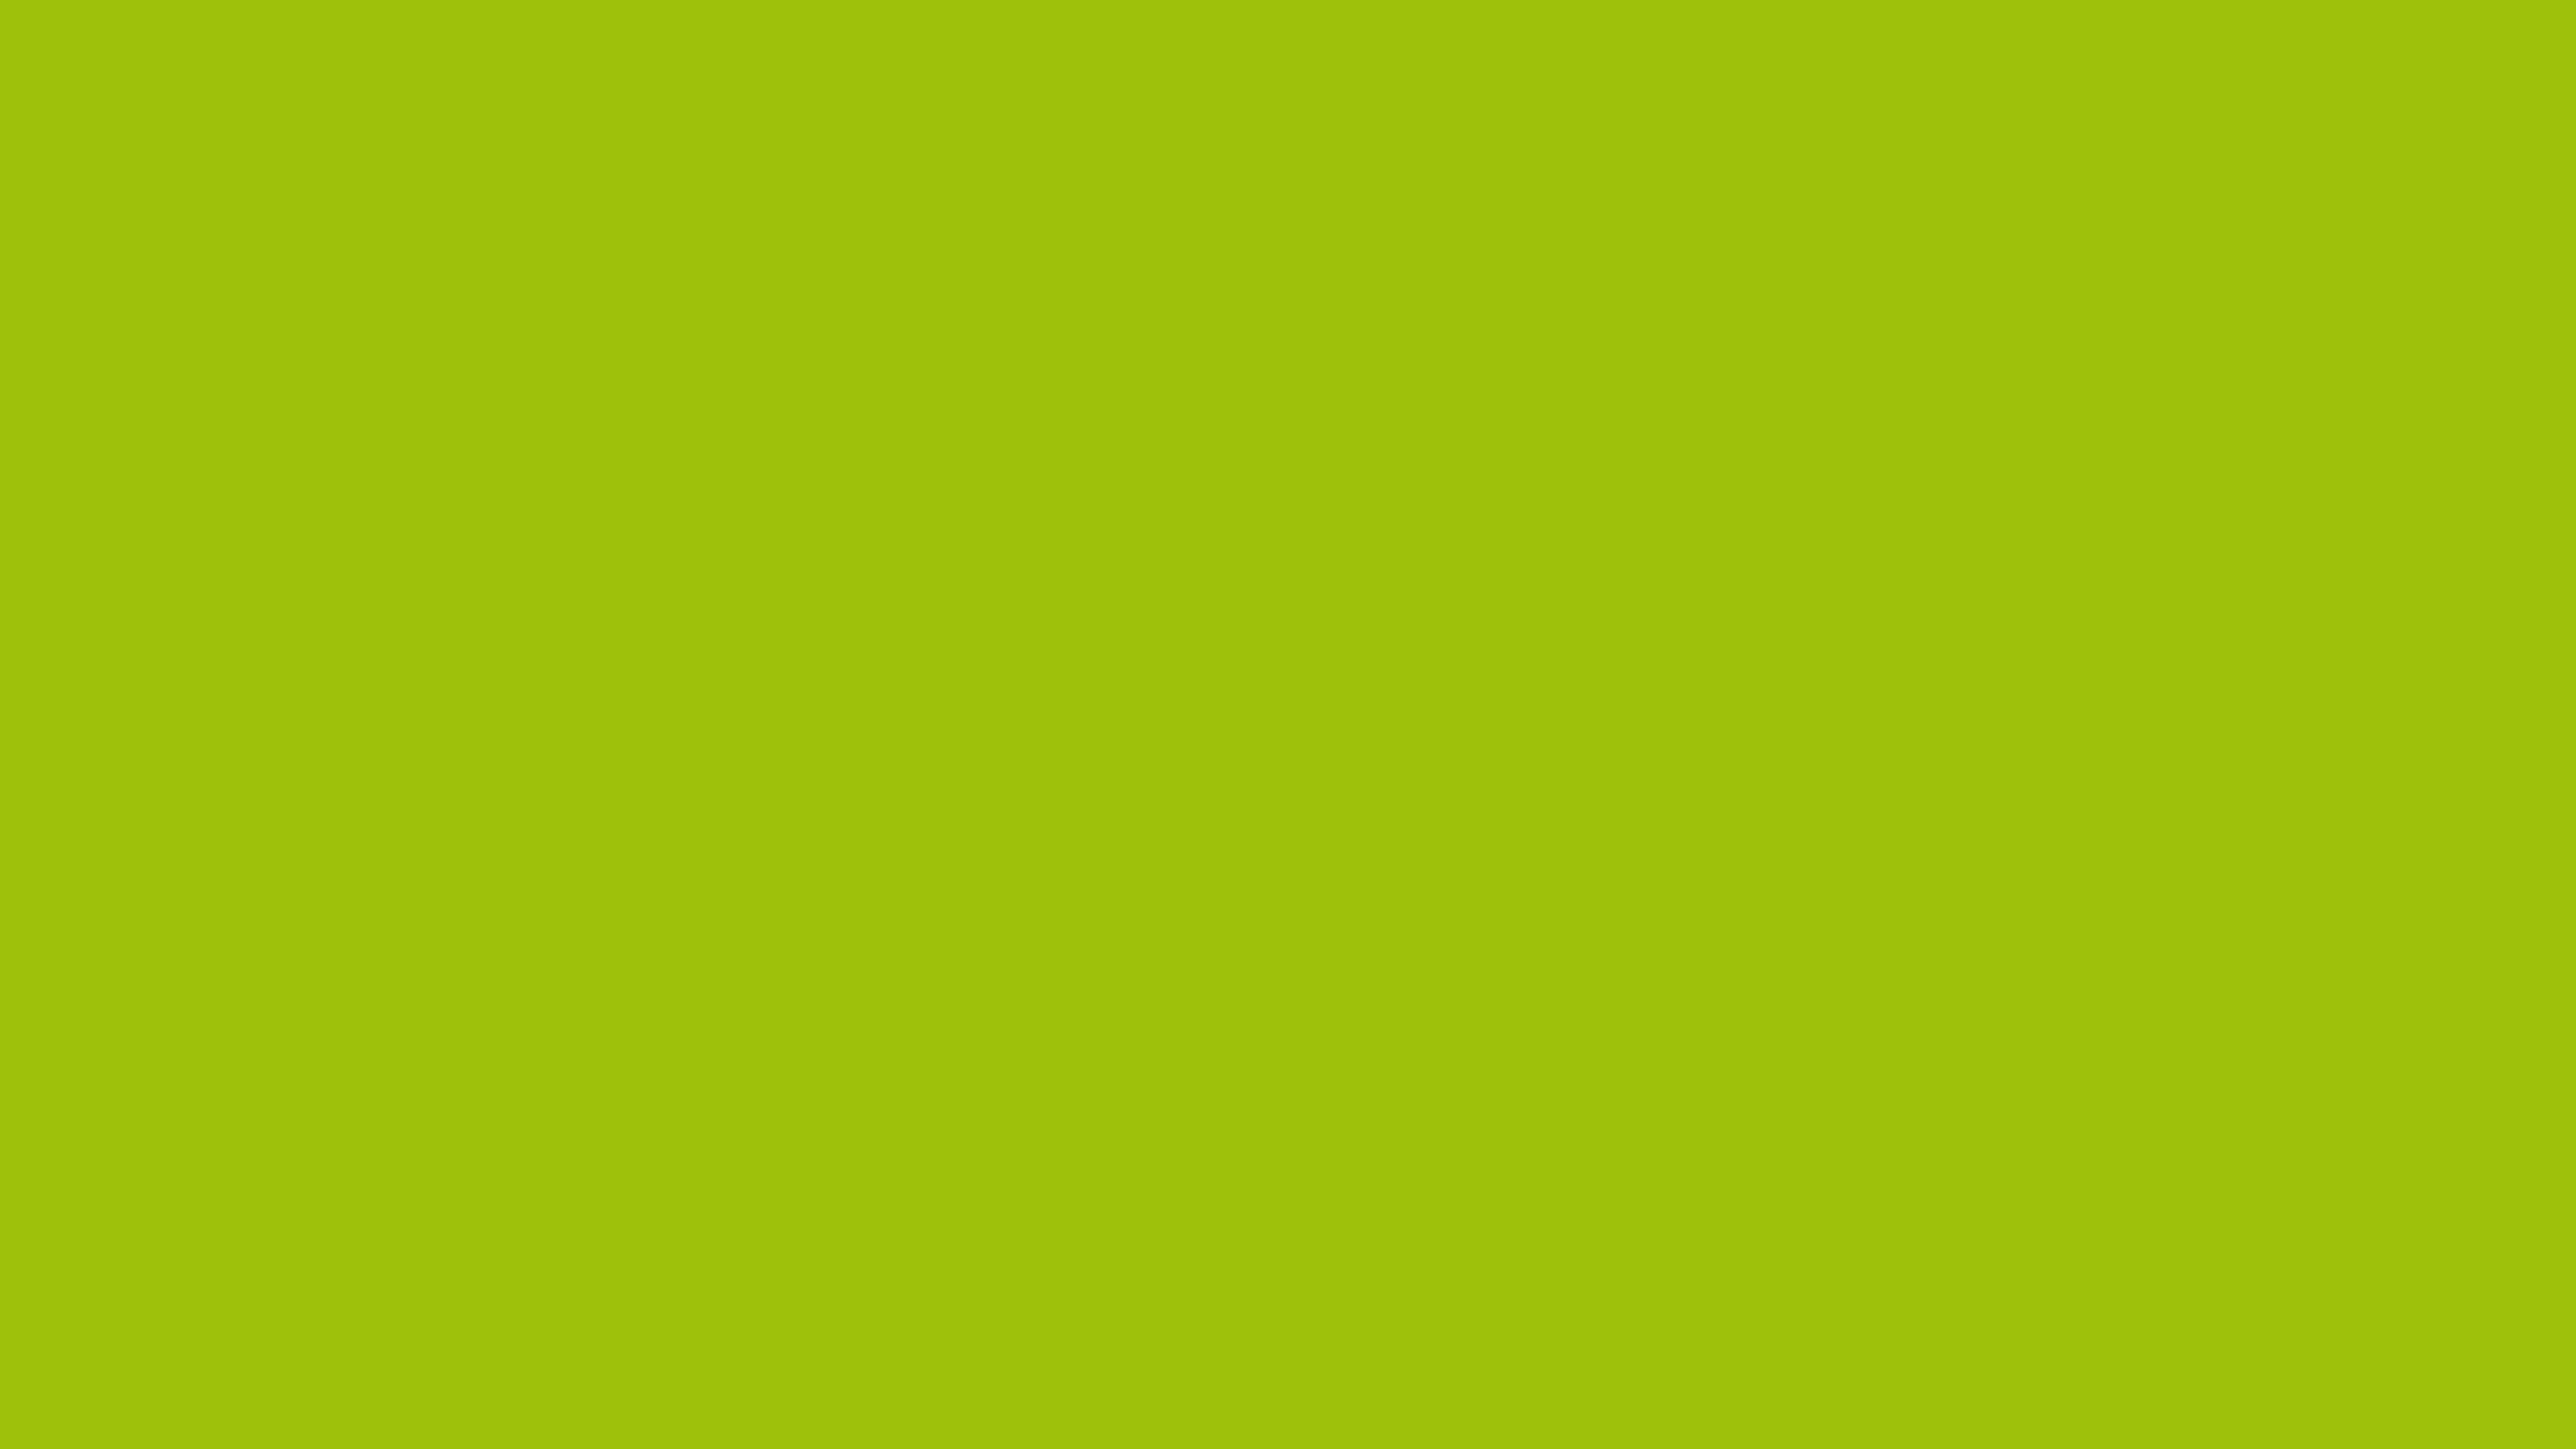 7680x4320 Limerick Solid Color Background